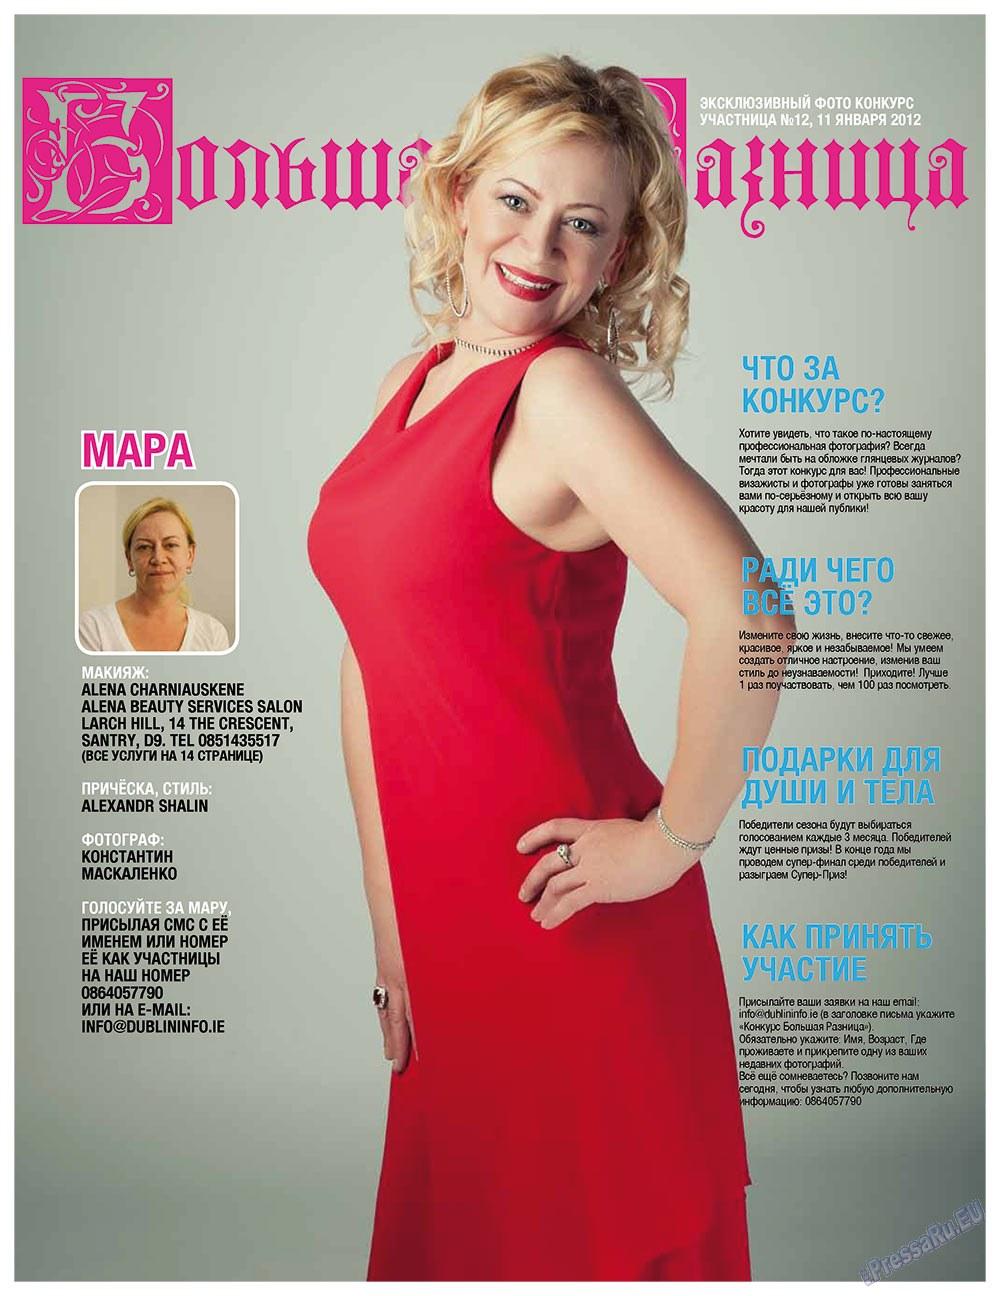 Дублин инфоцентр (газета). 2012 год, номер 3, стр. 6